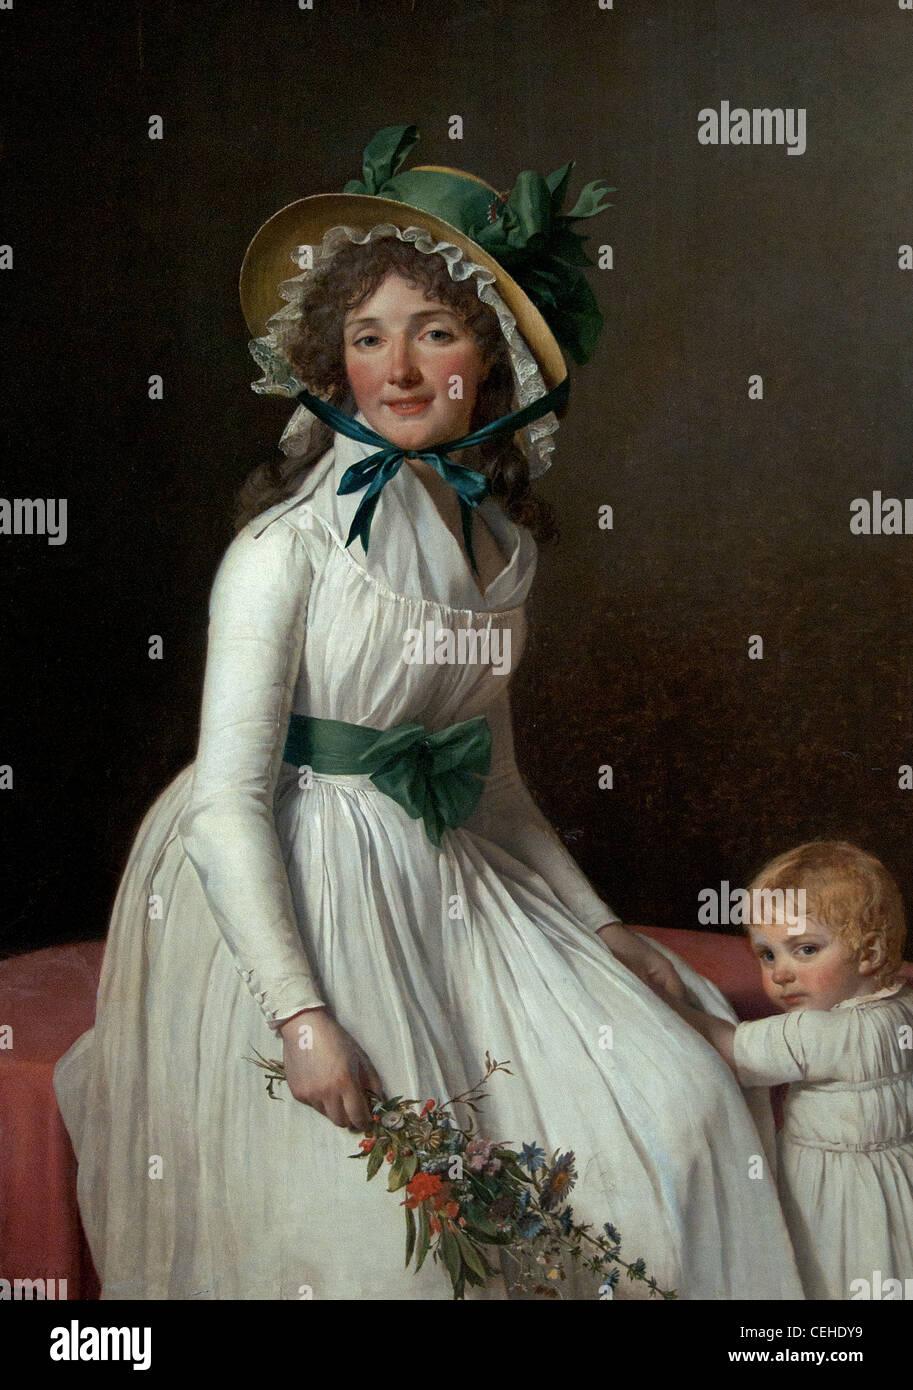 Madame Pierre Seriziat 1795 Jacques-Louis David 1748 – 1825 France French - Stock Image